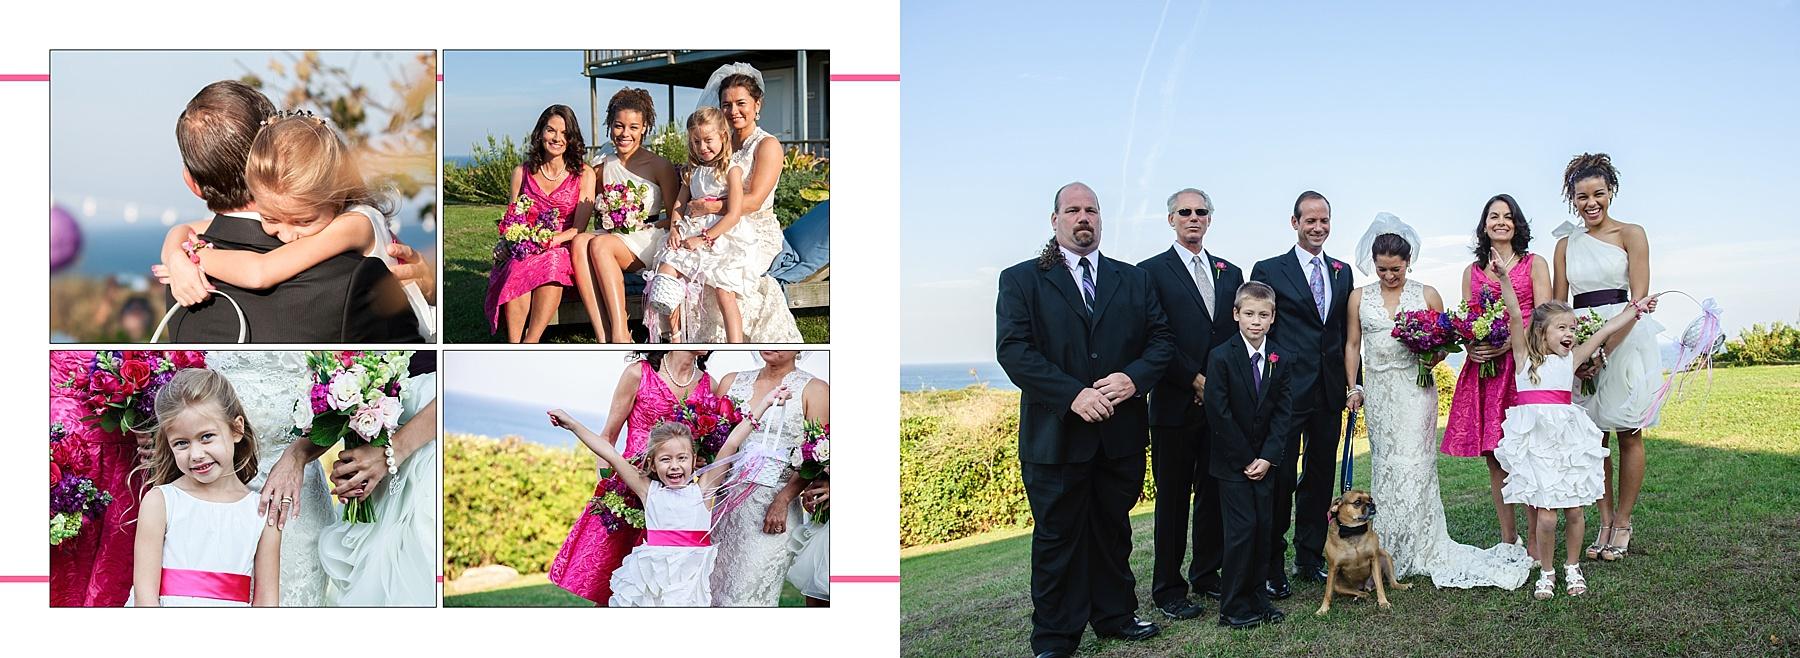 spread09_Wedding Album_Block Island RI WEB.jpg